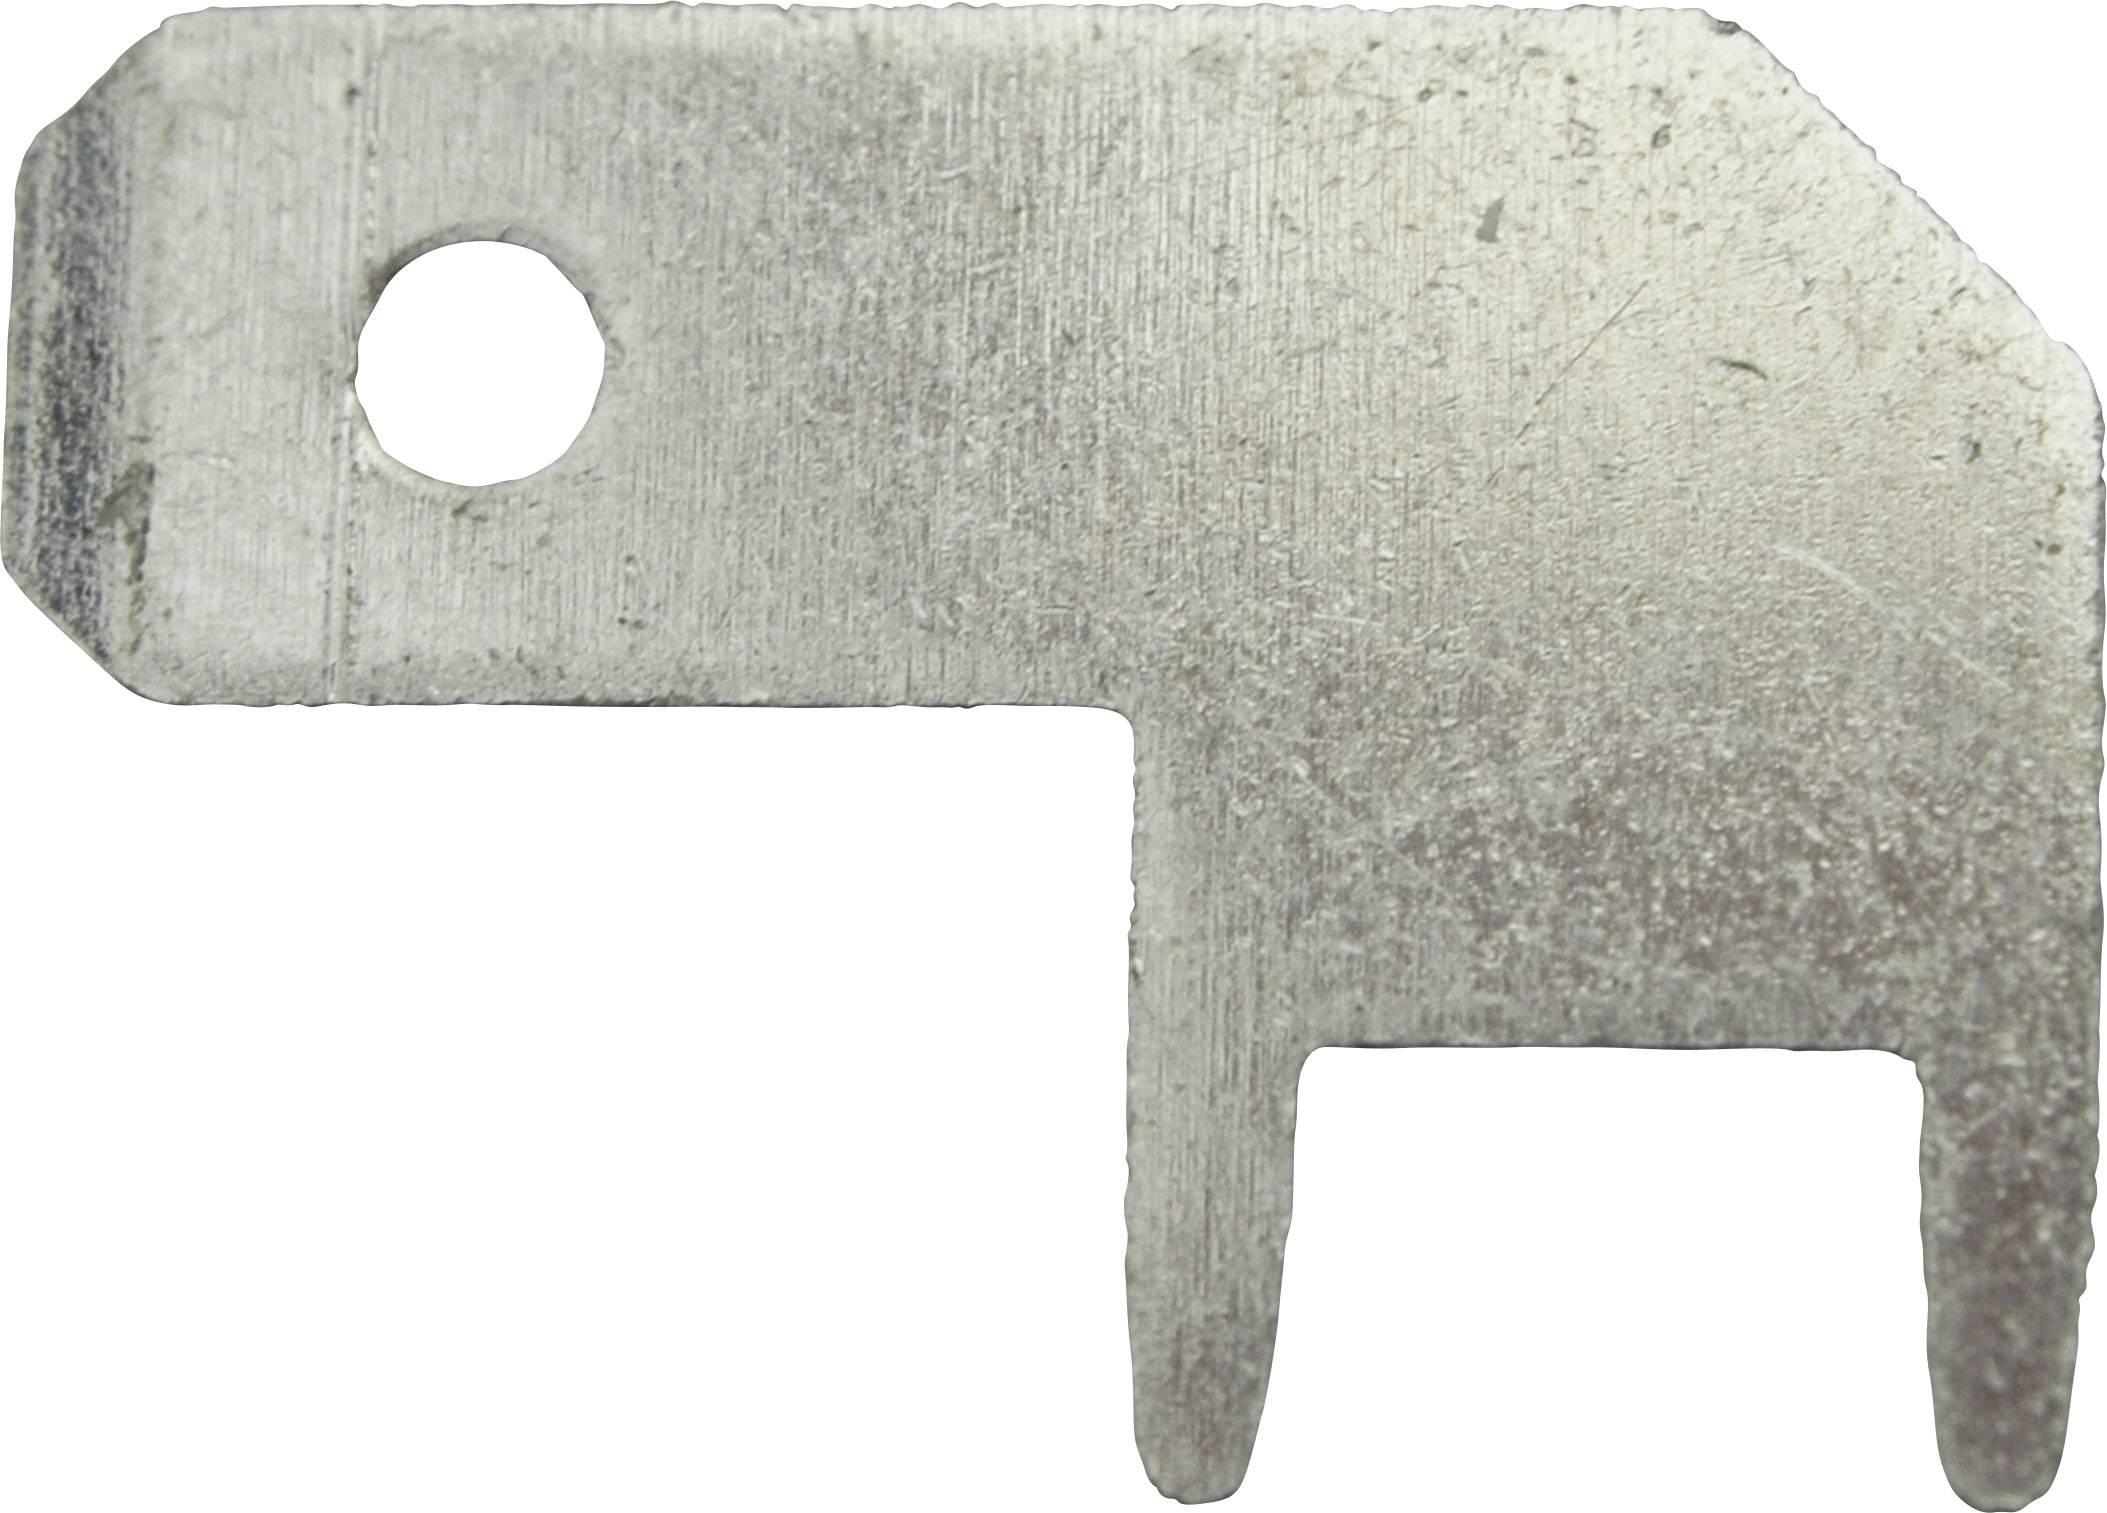 Faston zástrčka Vogt Verbindungstechnik 3827b08.68 4.8 mm x 0.8 mm, 90 °, bez izolace, kov, 100 ks